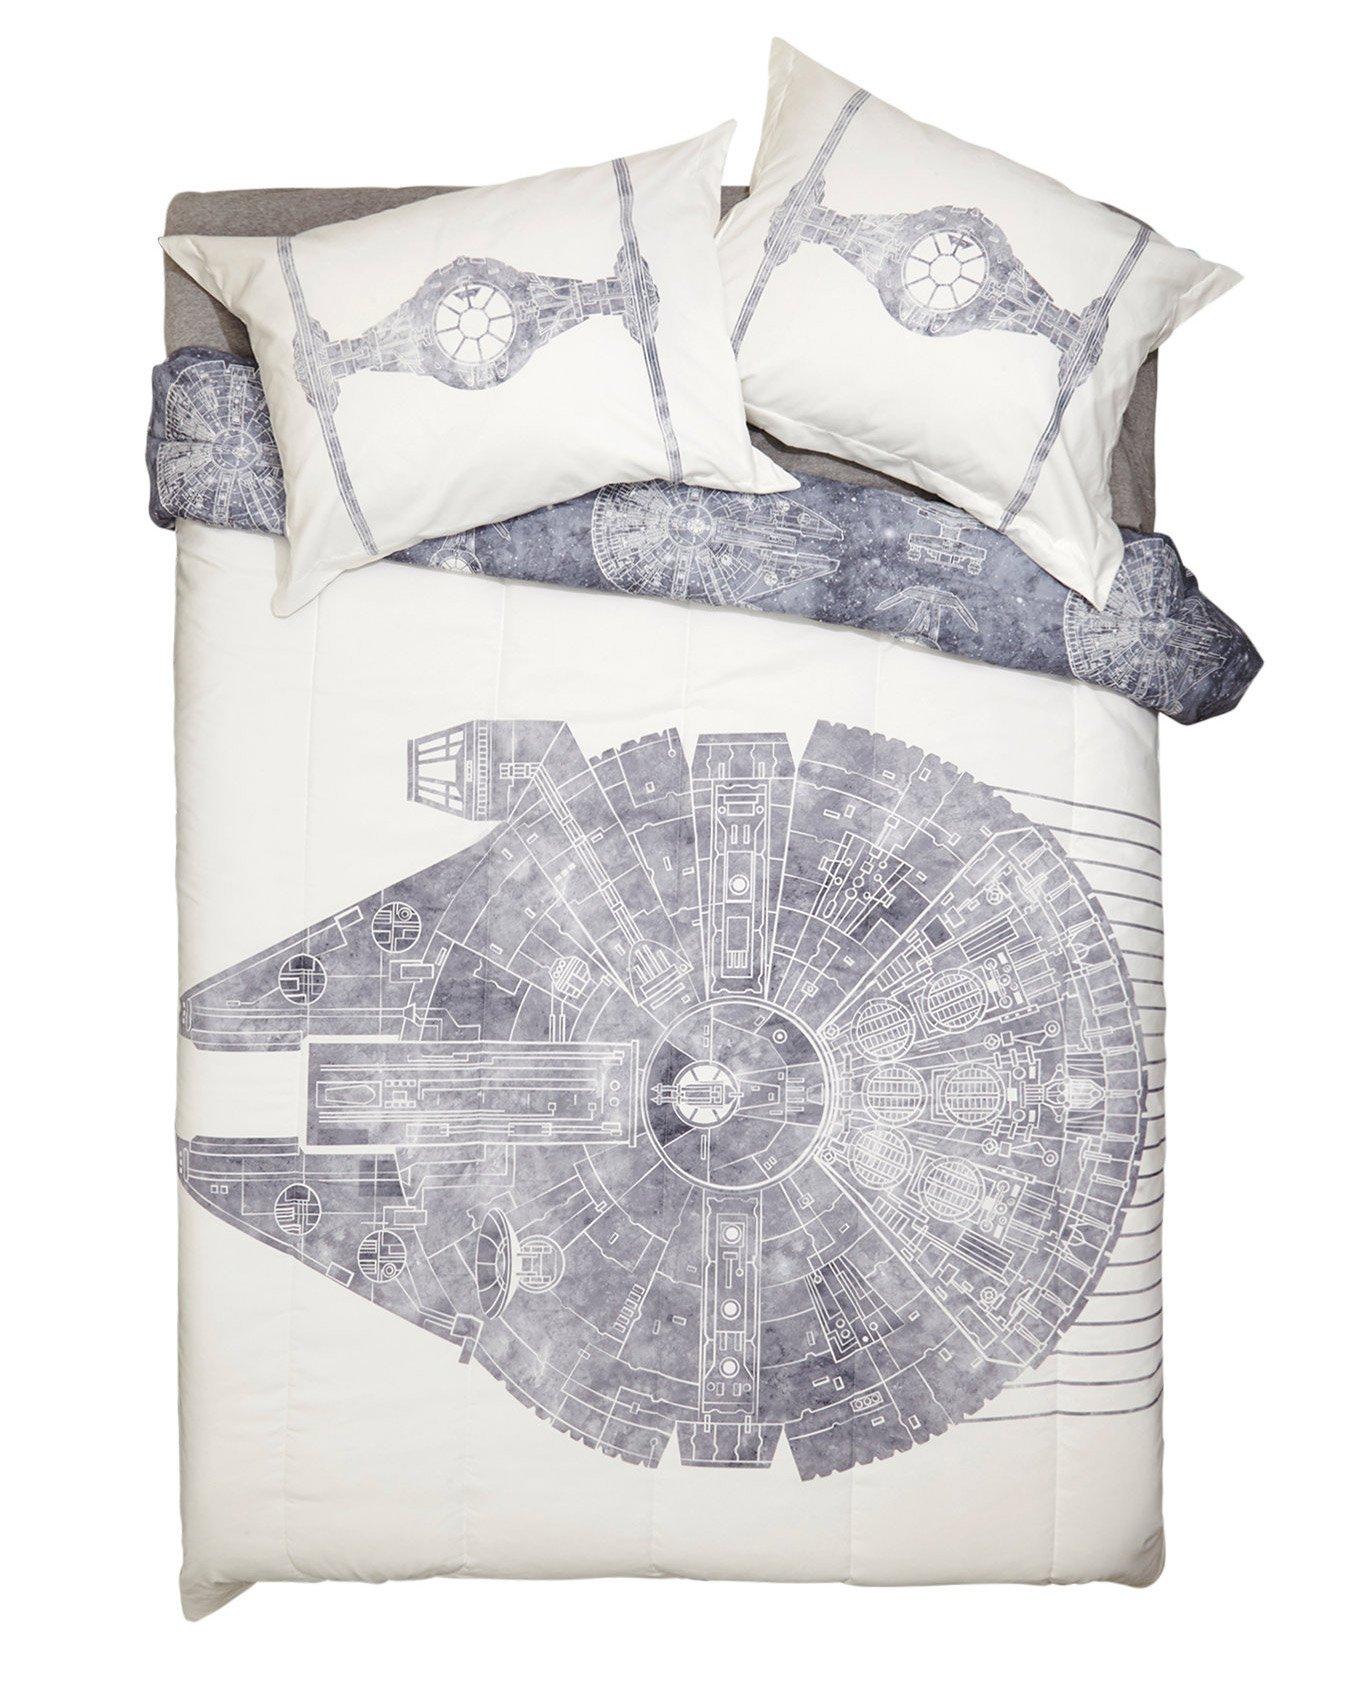 Star Wars Millennium Falcon 3pc Full/Queen Size Comforter & Pillow Sham Set